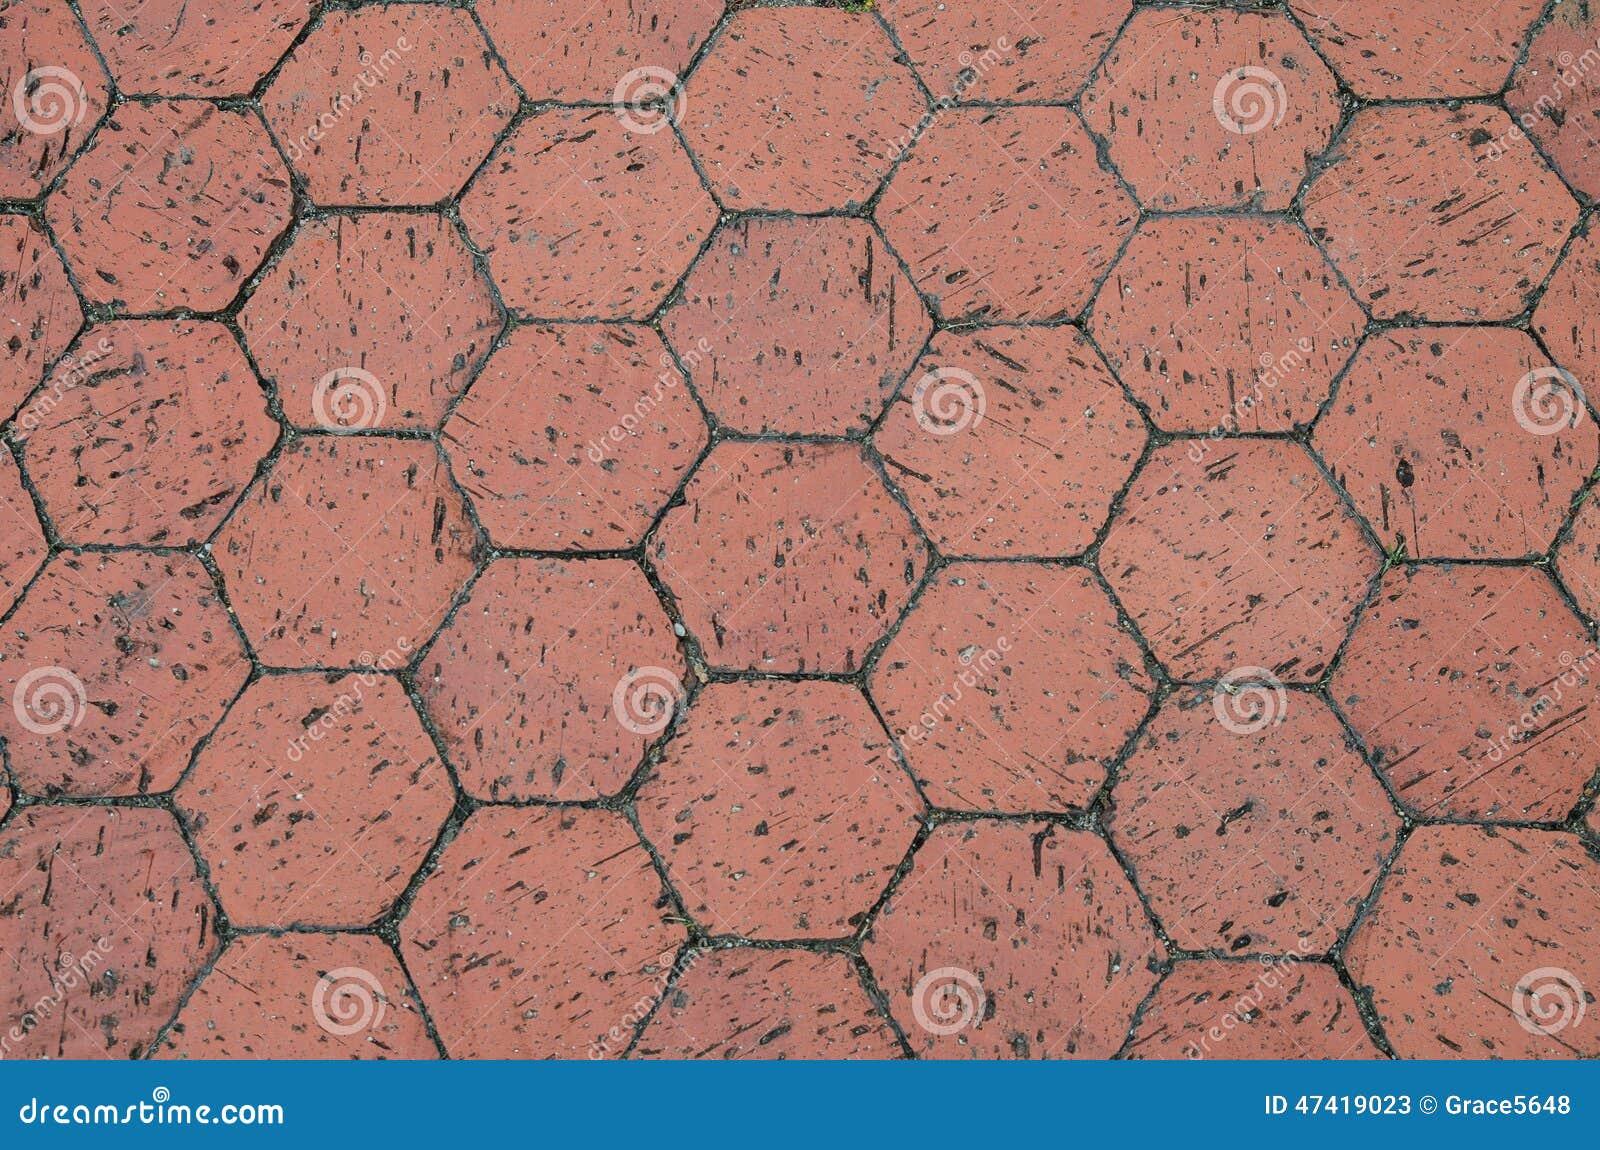 Red Hexagon Terracotta Tiles Stock Image Image Of Material Tiled